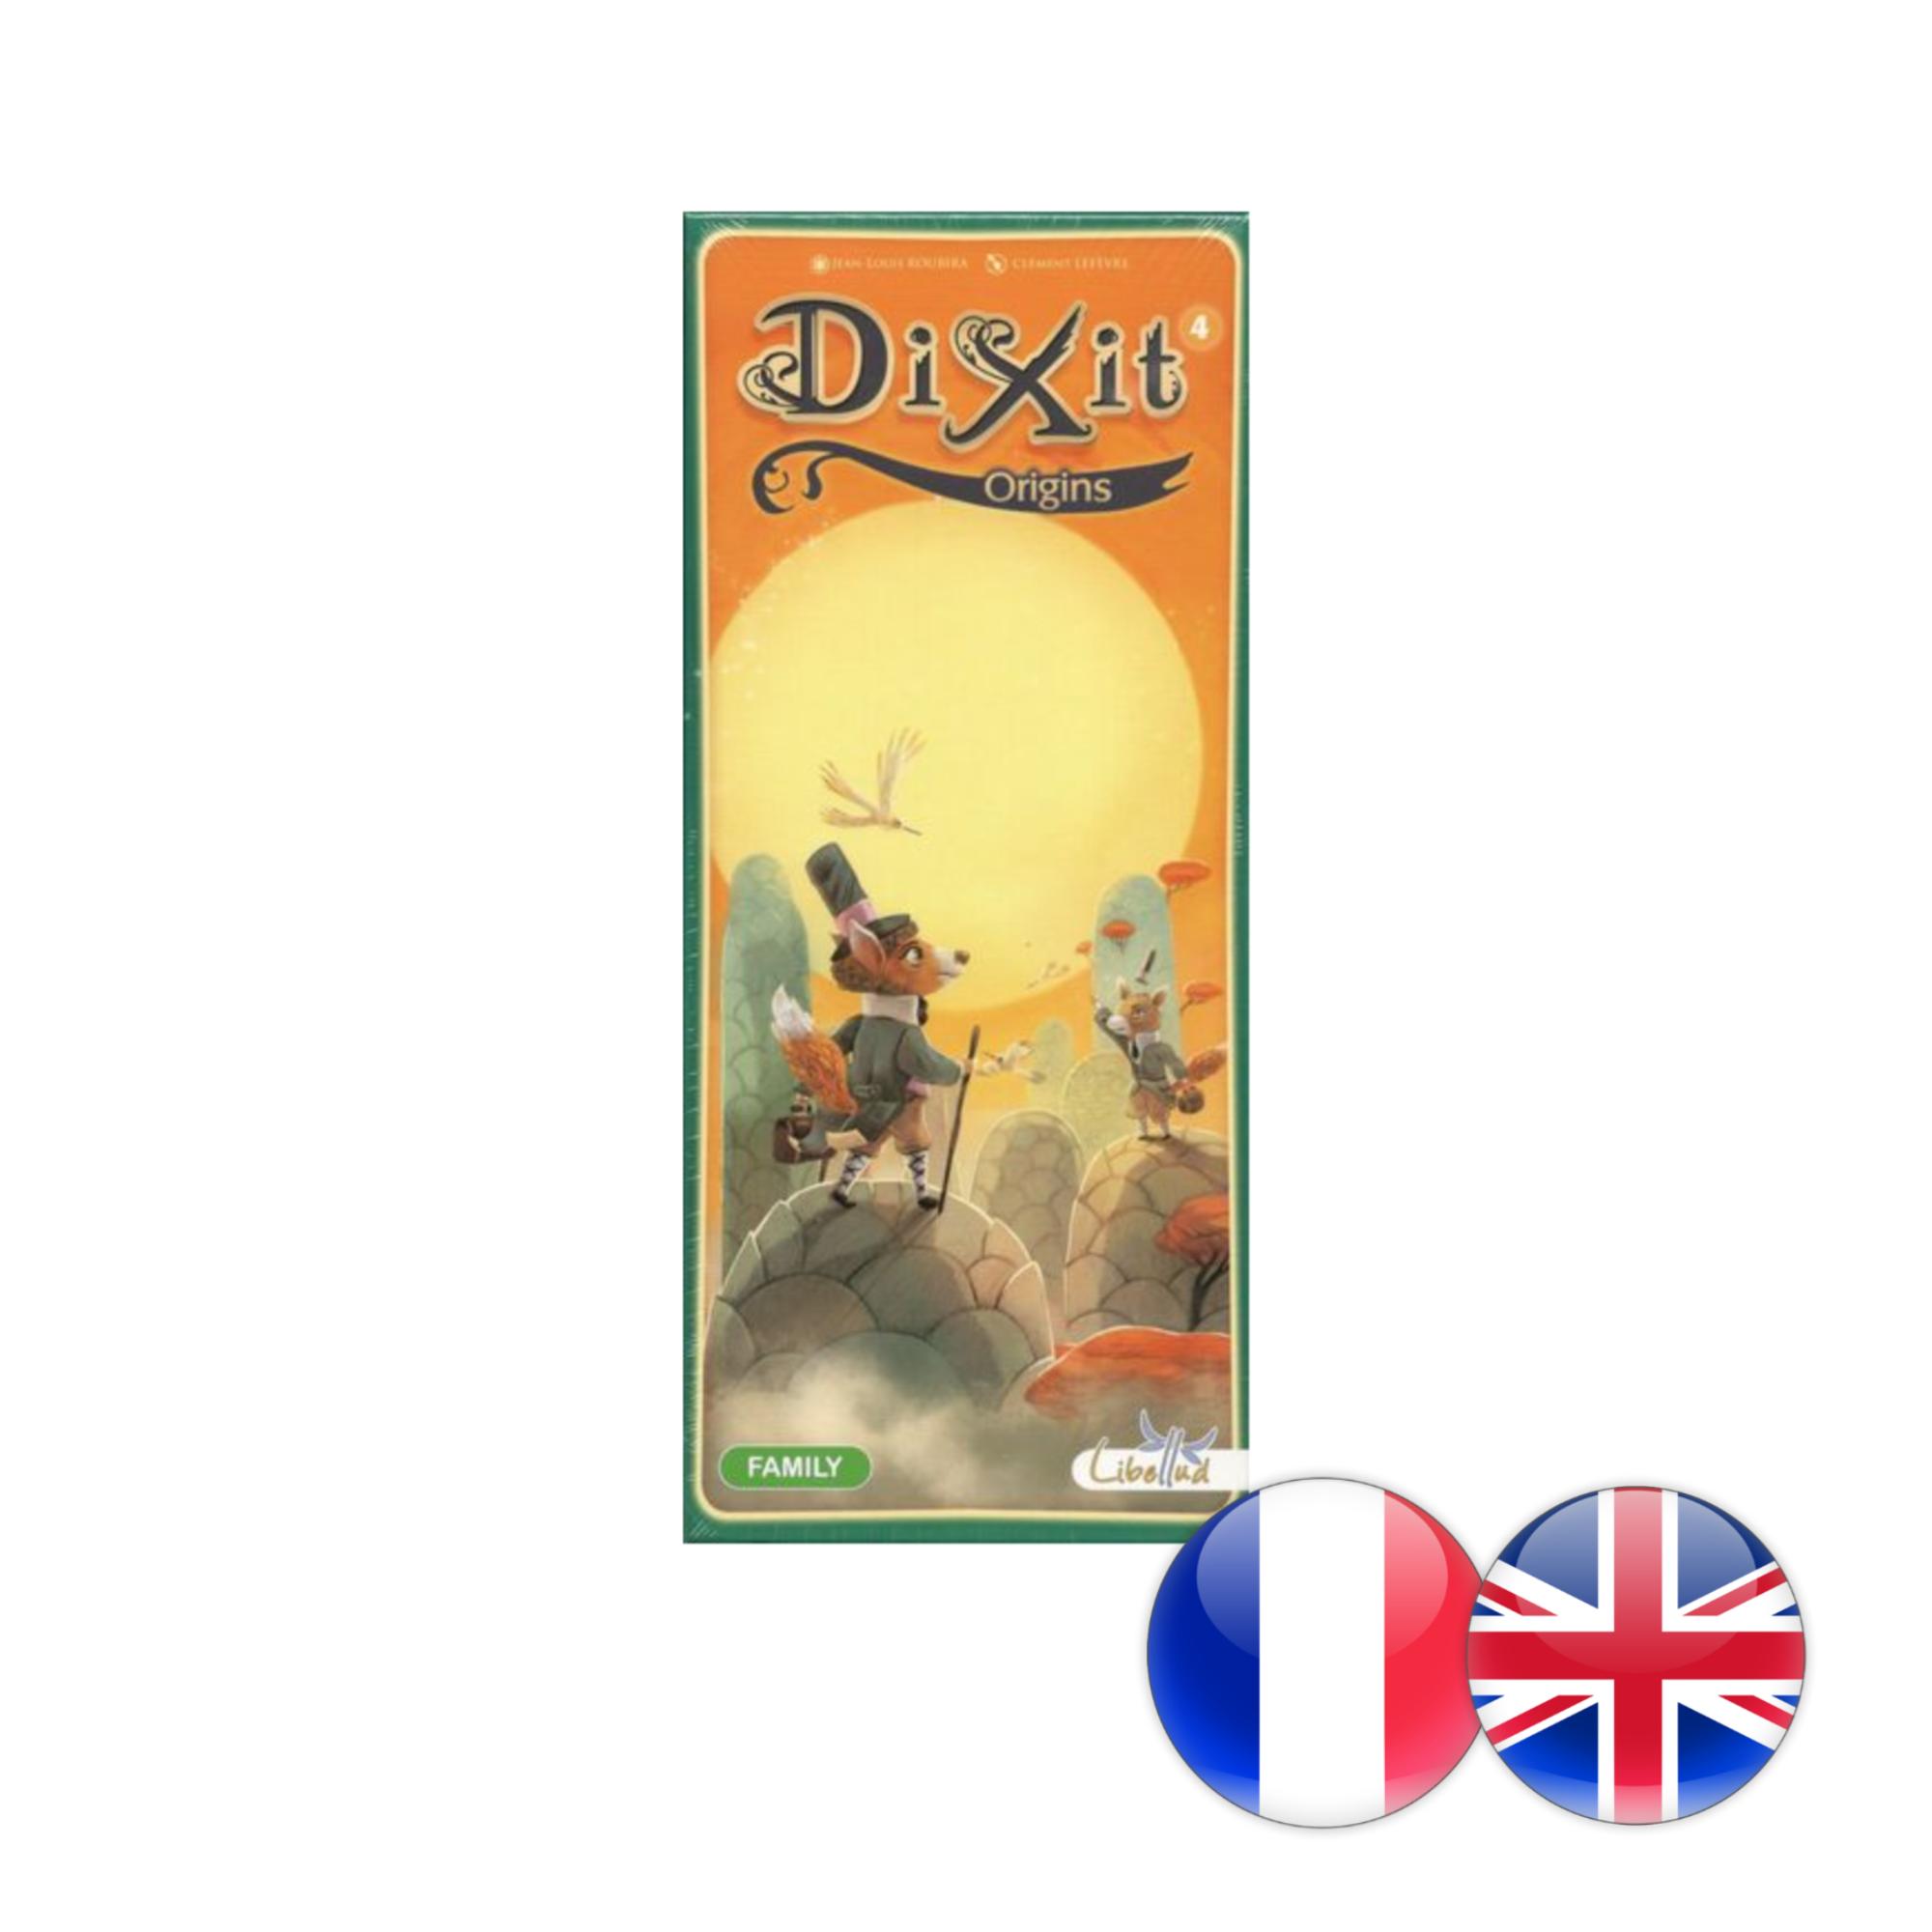 Filosofia Dixit 4 - Ext. Origins (VF)